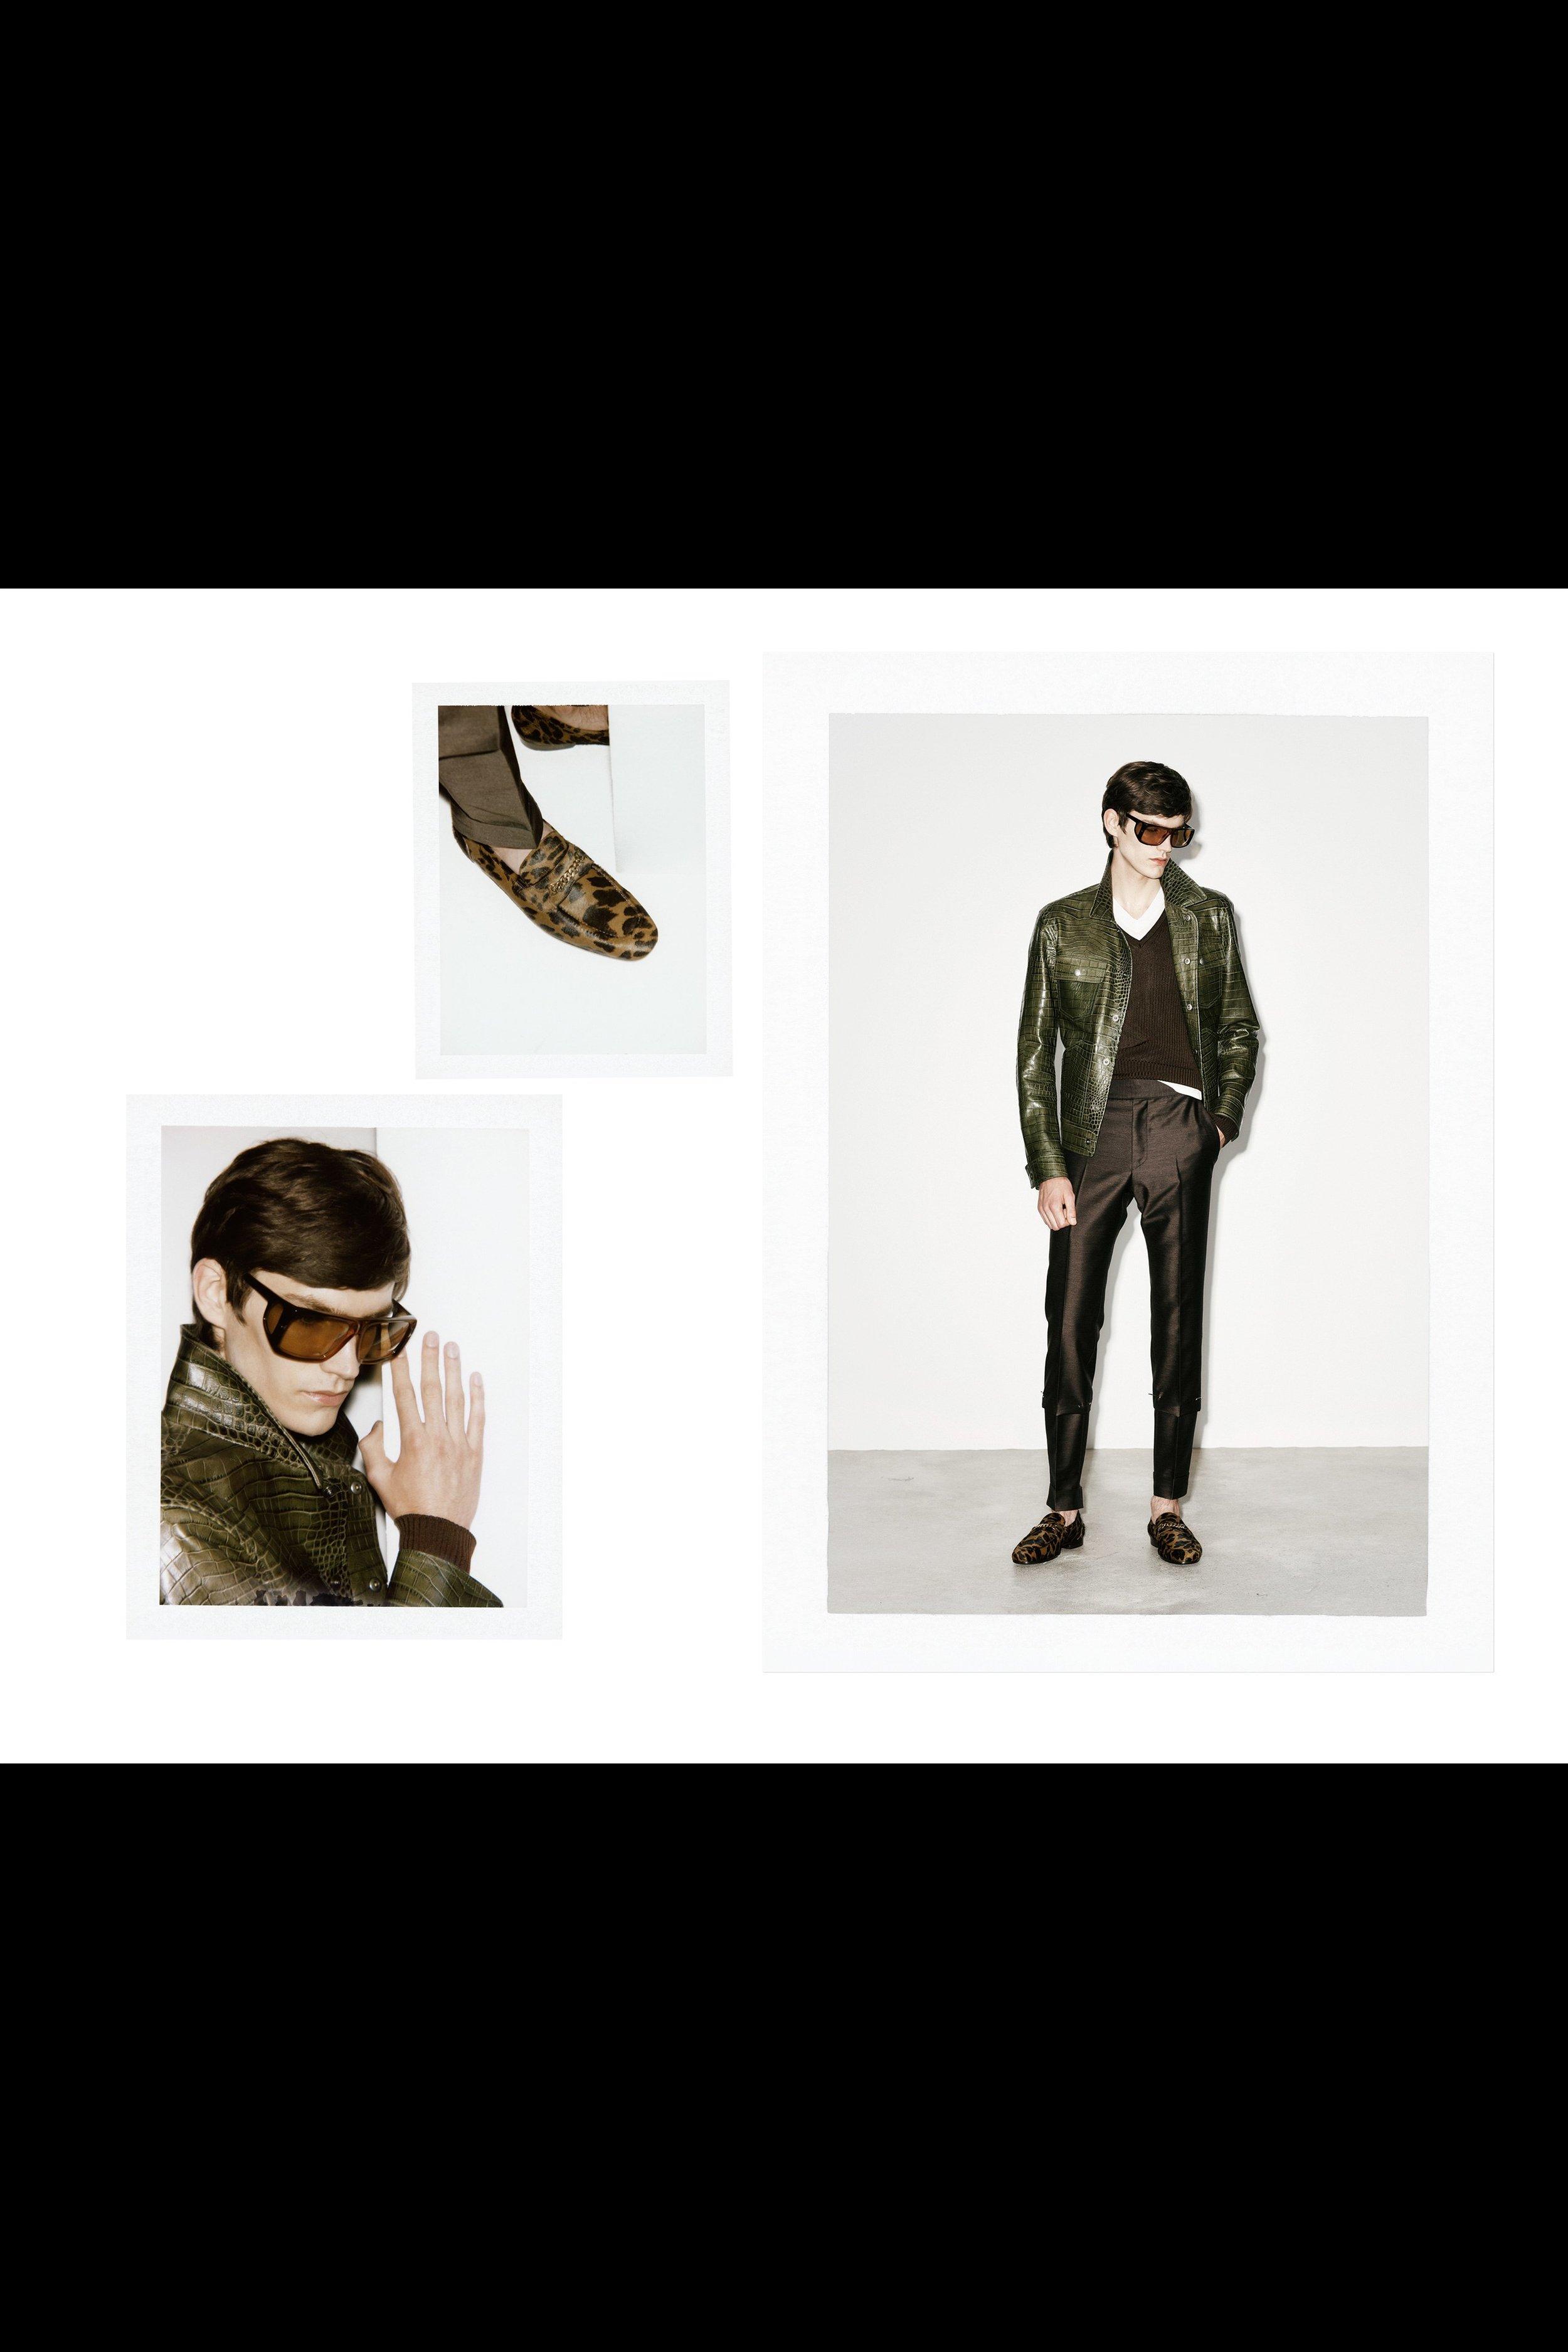 00021-Tom-Ford-vogue-menswear-spring-2019-pr.jpg